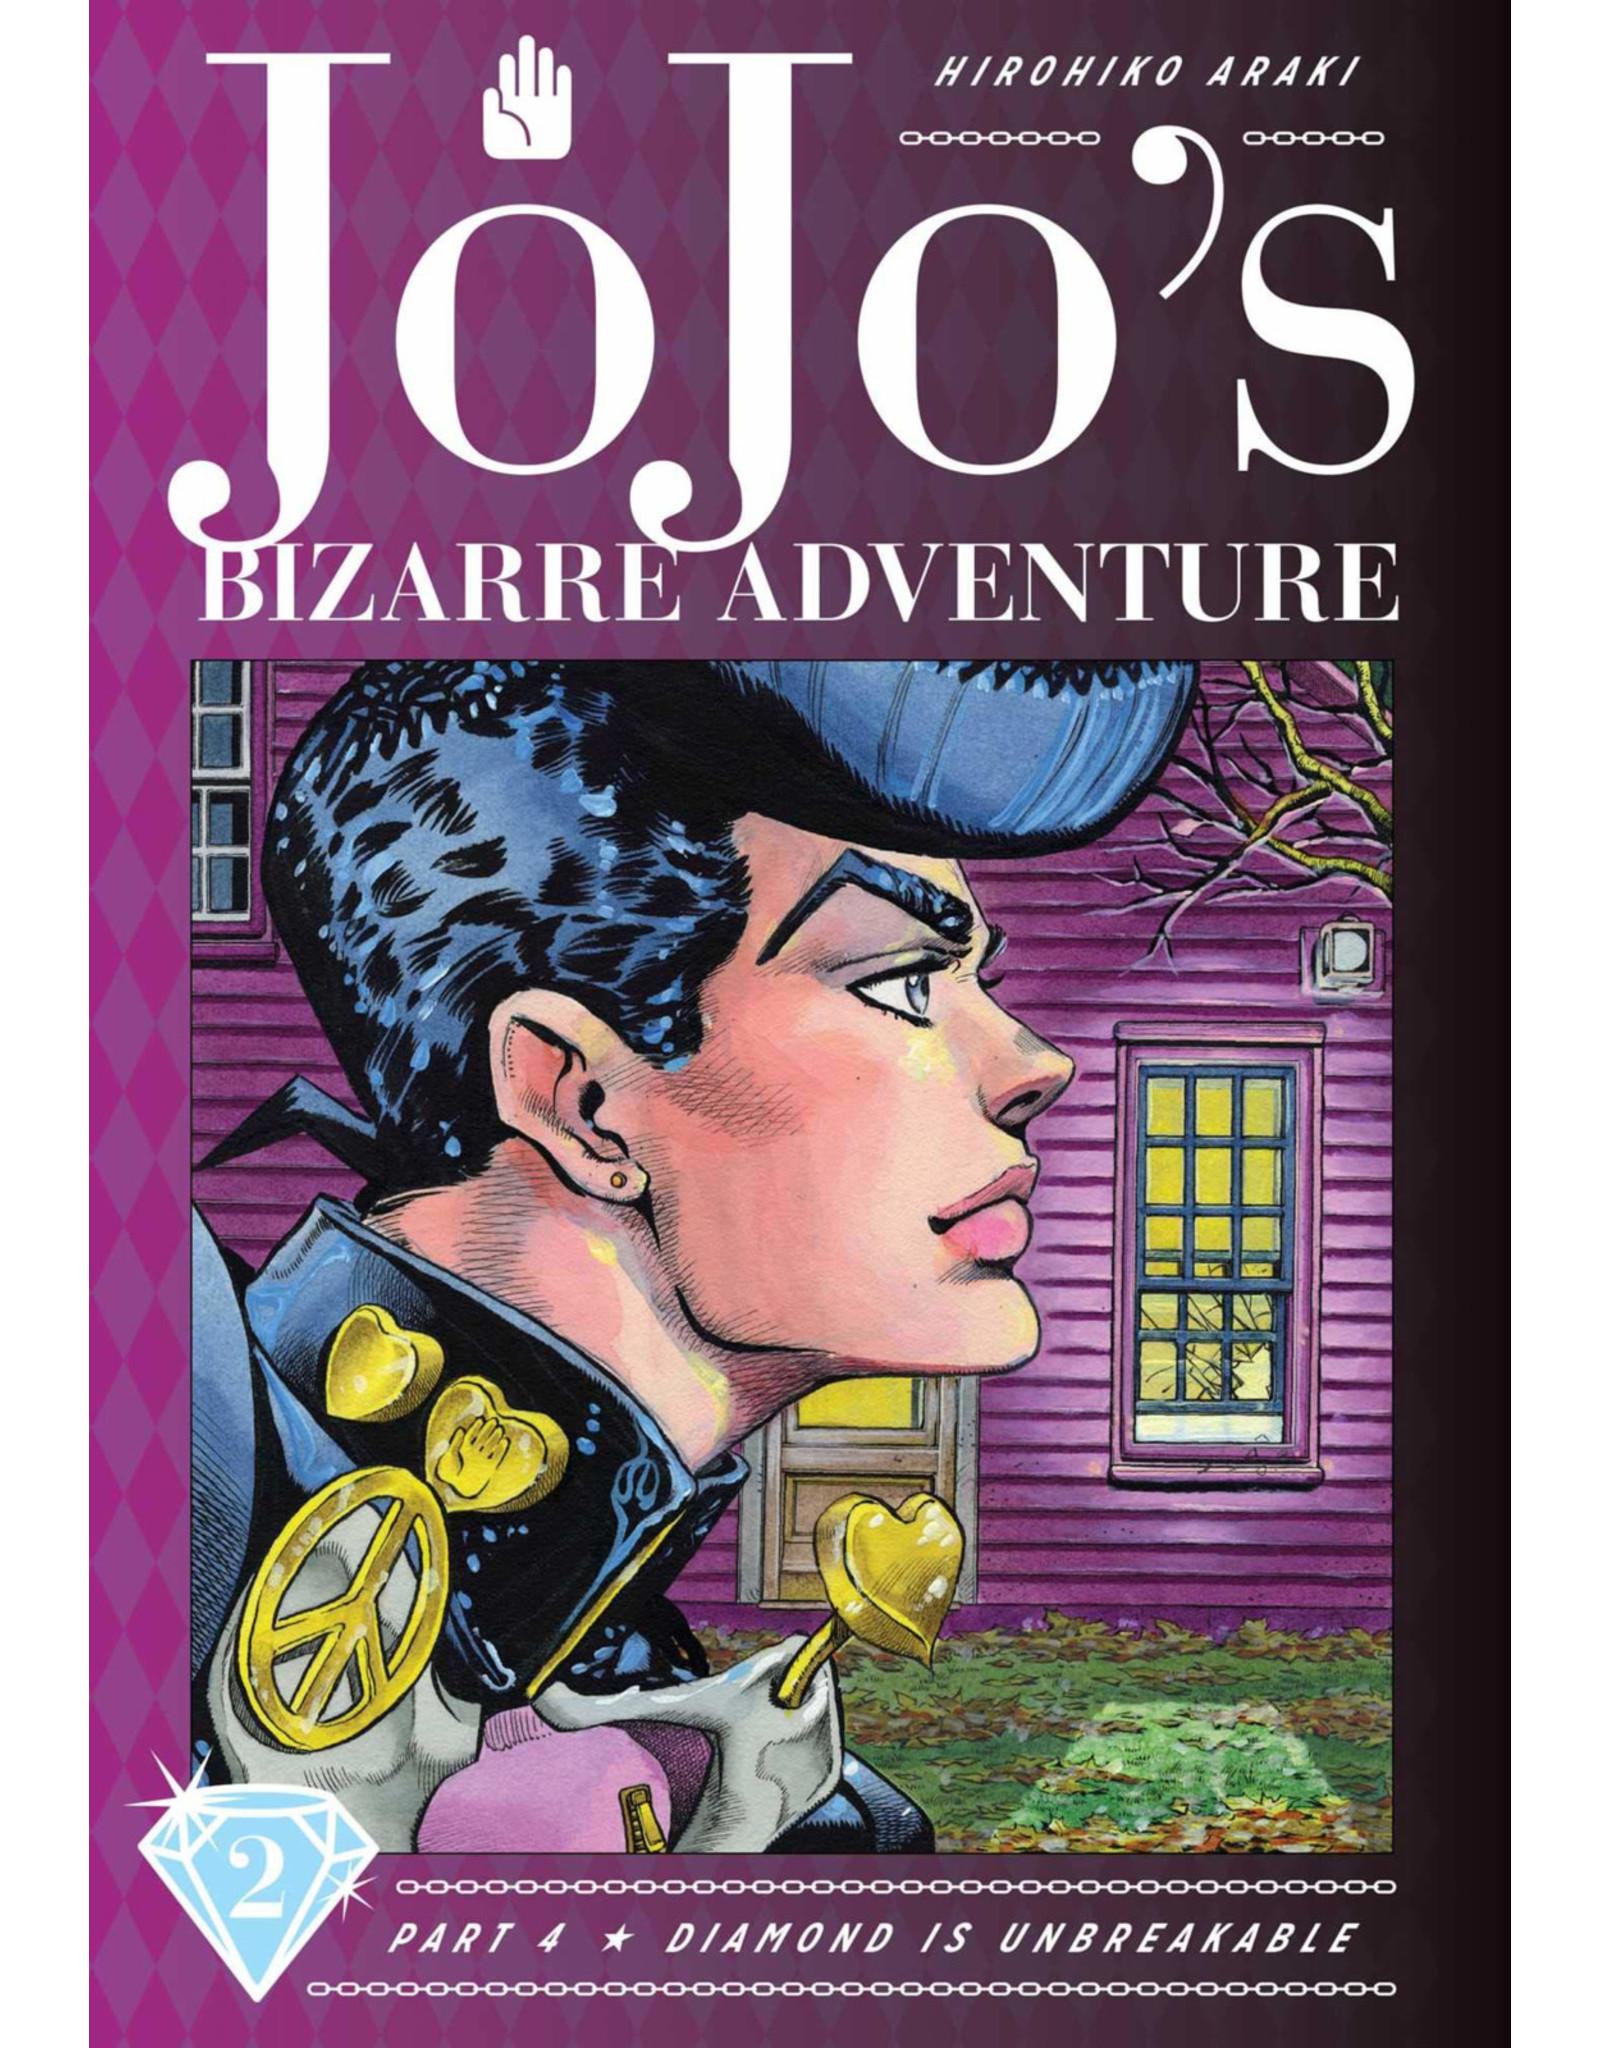 Jojo's Bizarre Adventure - Part 4: Diamond is Unbreakable - Volume 2 - Hardcover (English Version)